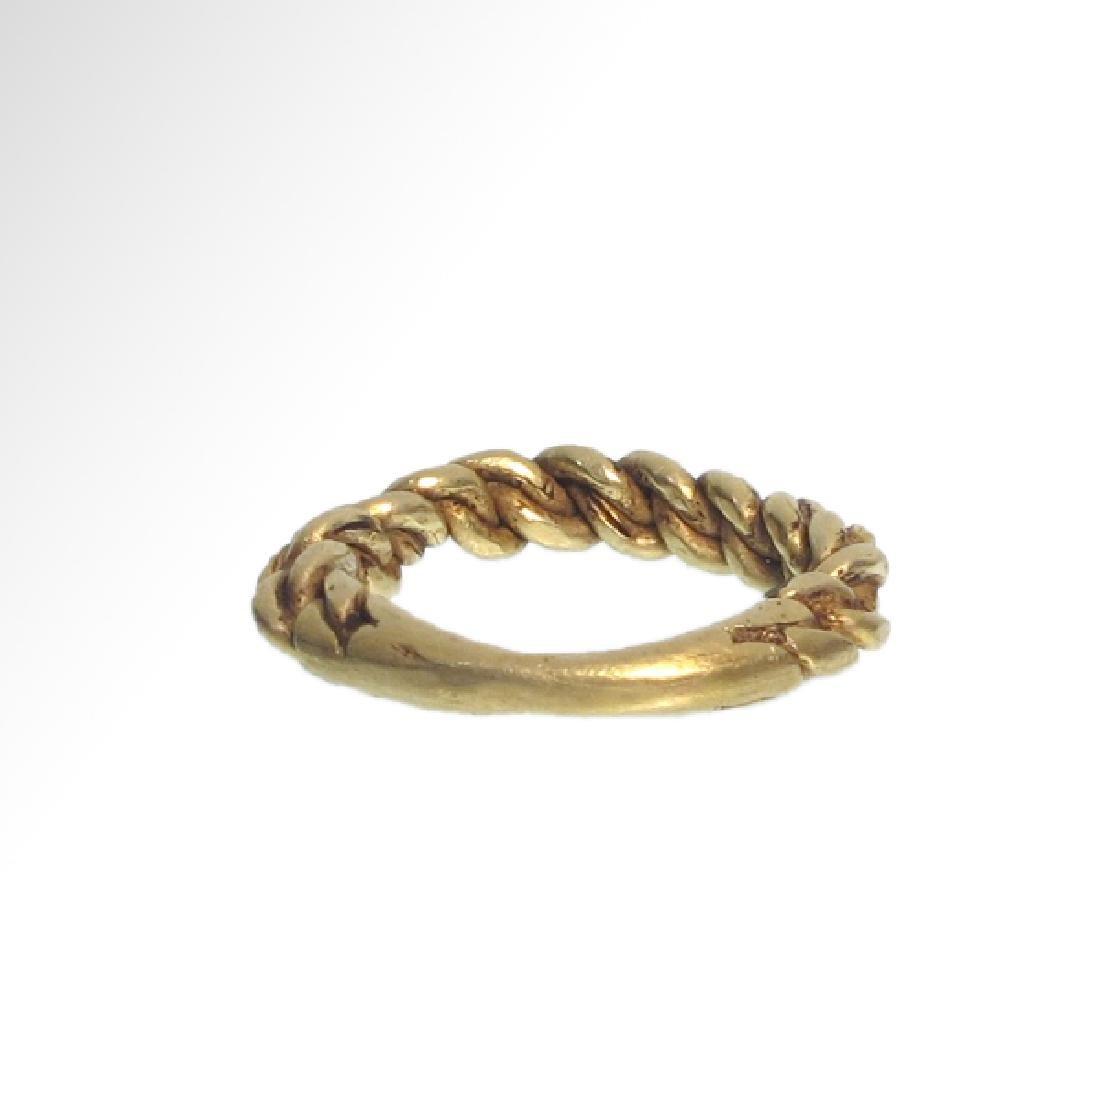 Viking Gold Ring, c. 10th Century A.D. - 7